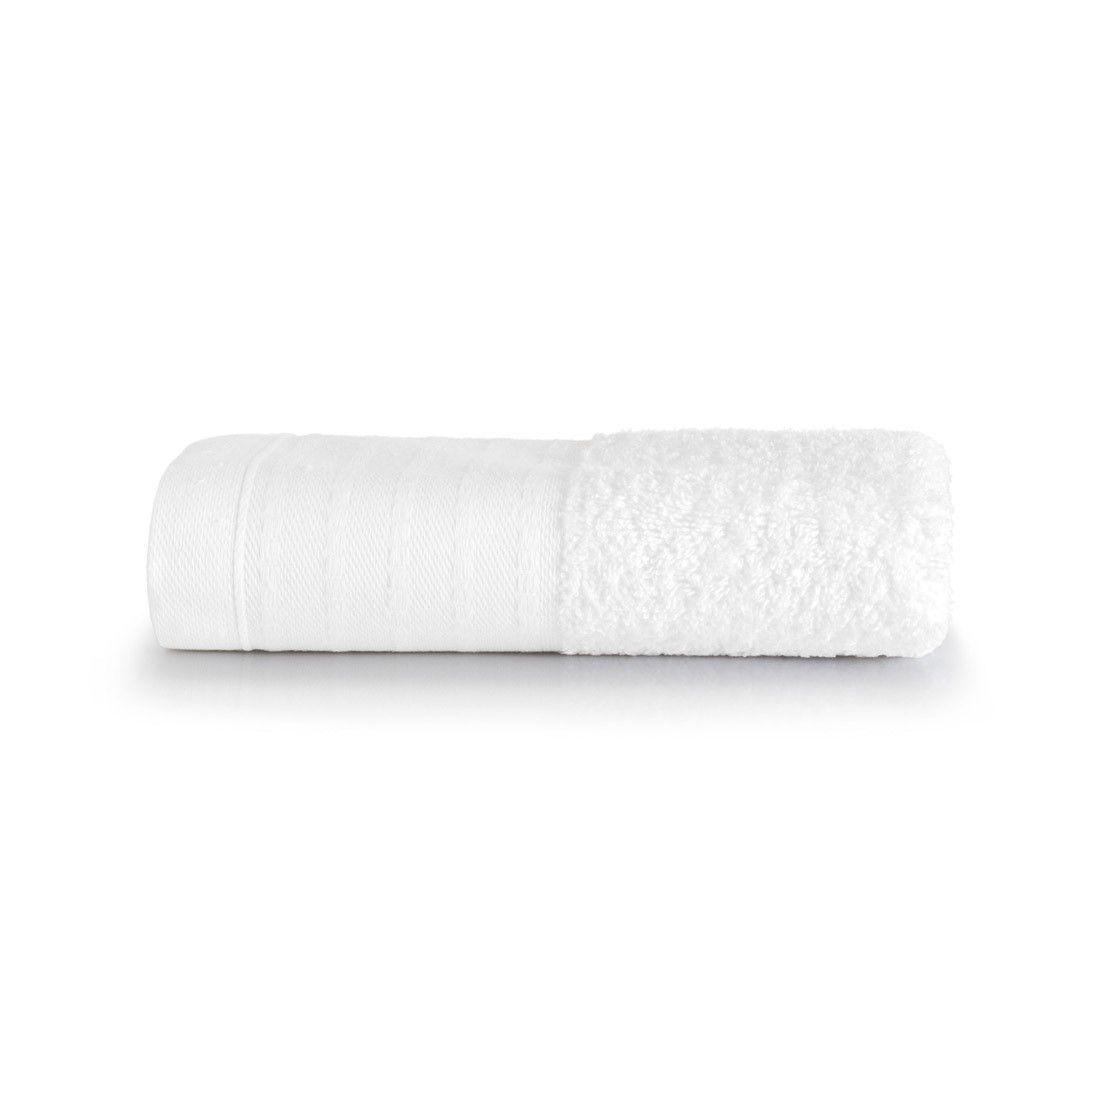 Toalha Lavabo Altenburg Intense 100% algodão 30cm x 50cm - Branco